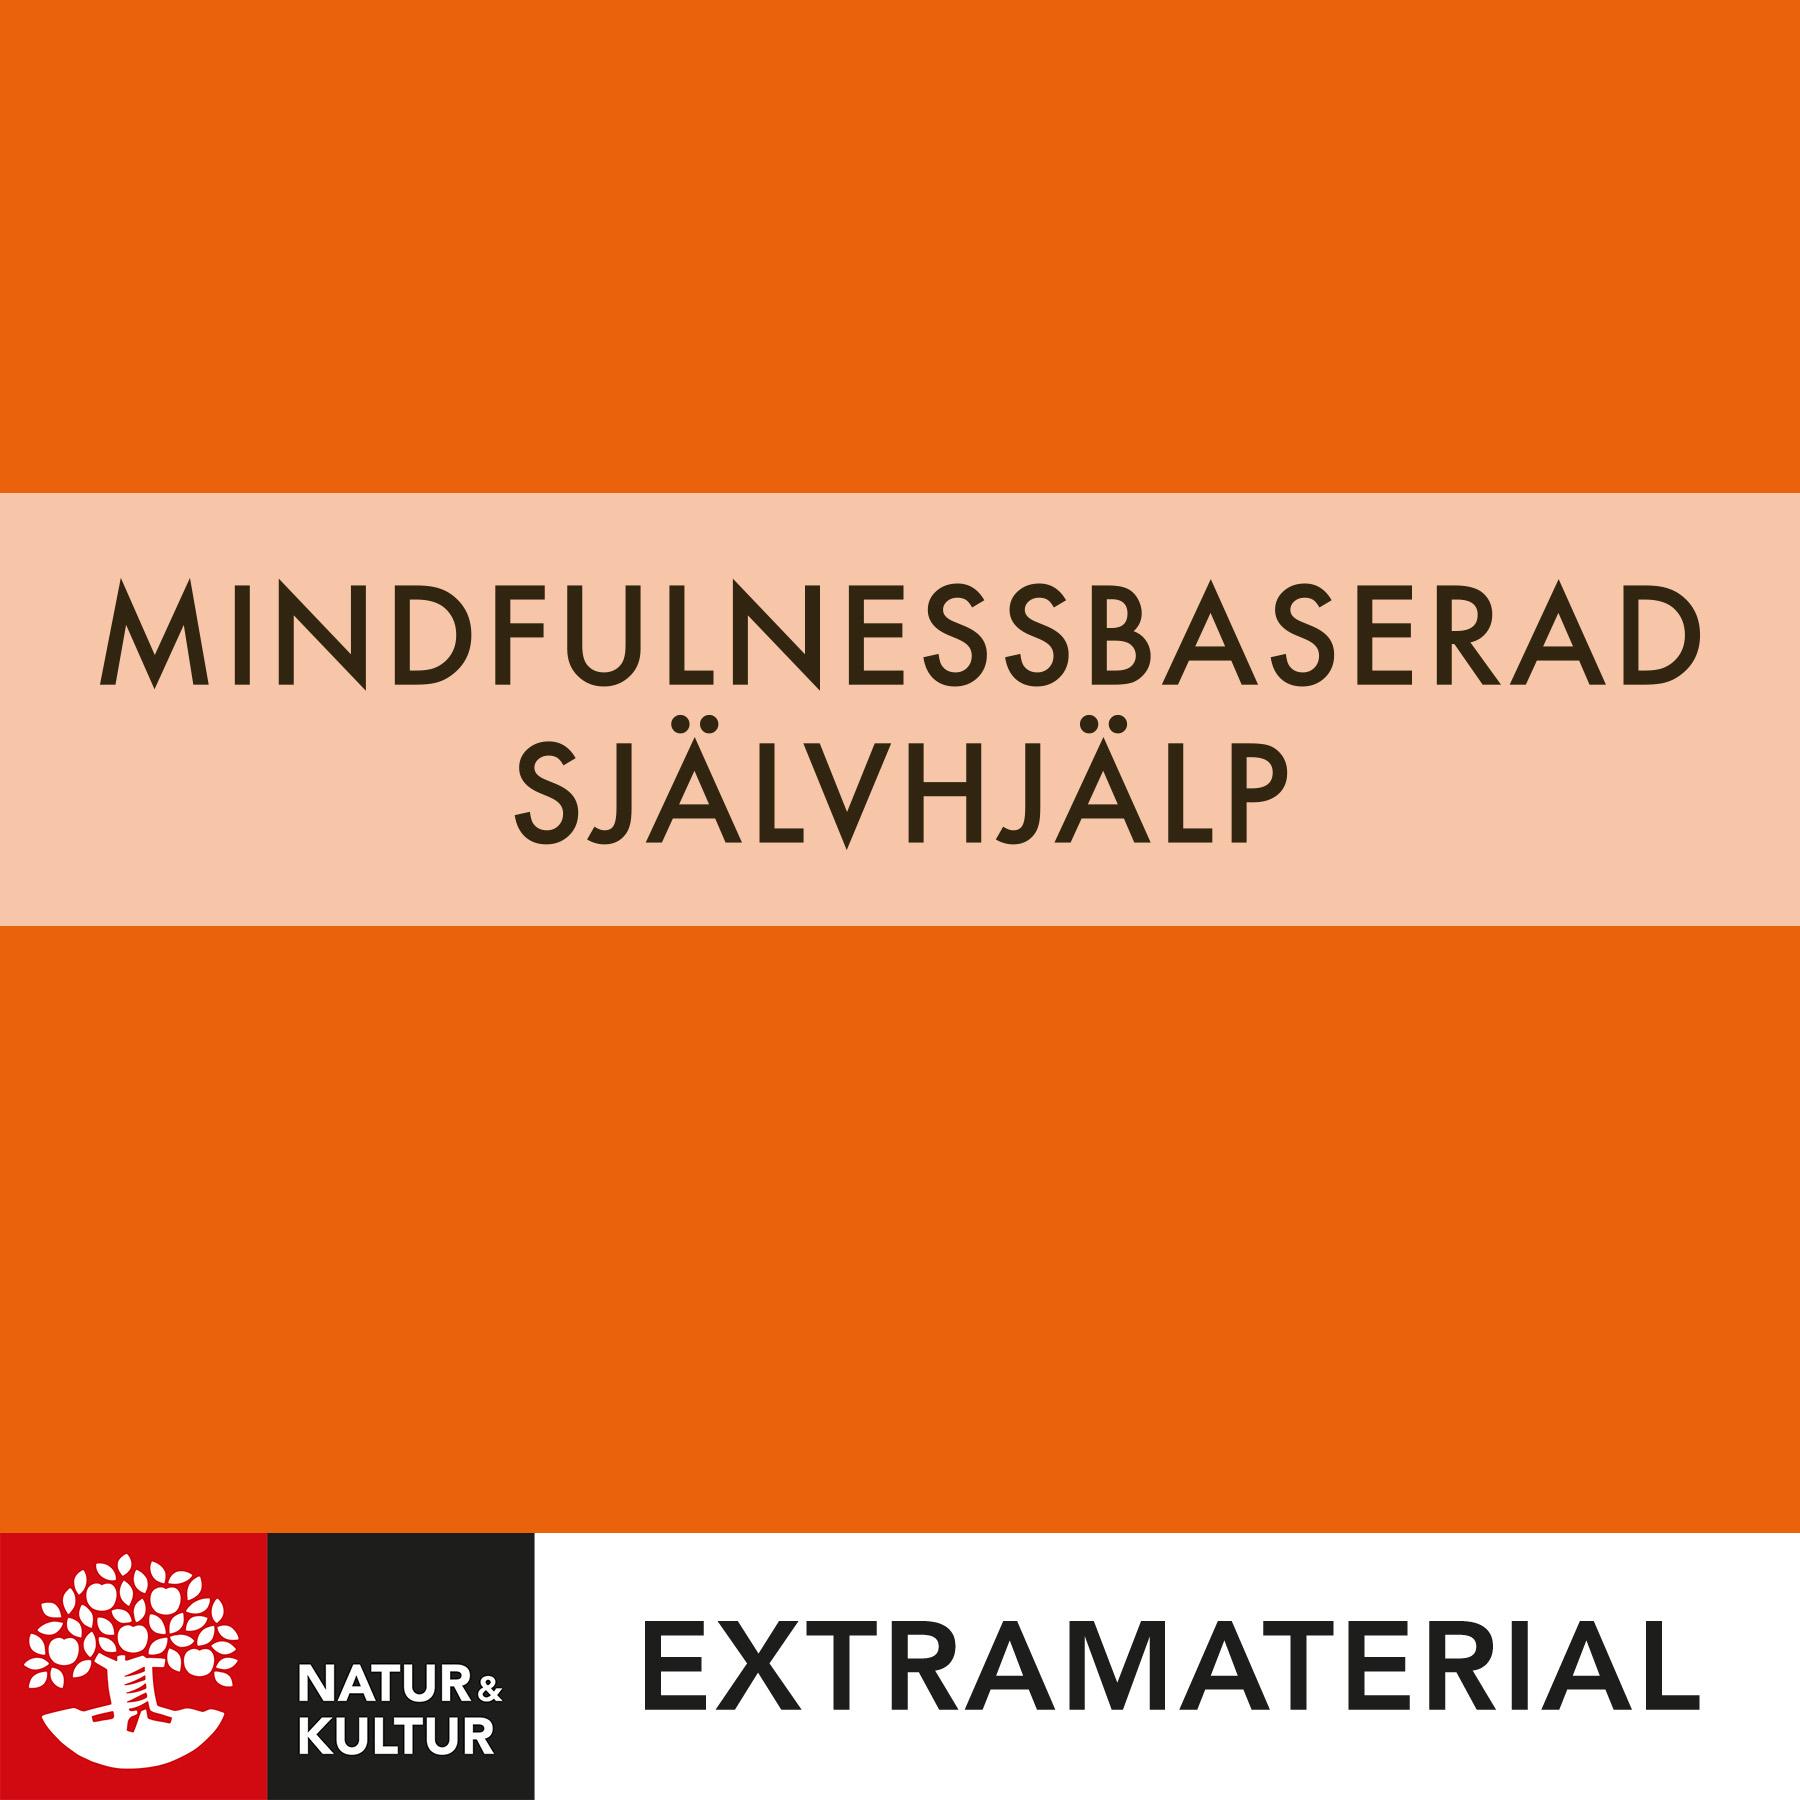 Mindfulnessbaserad självhjälp